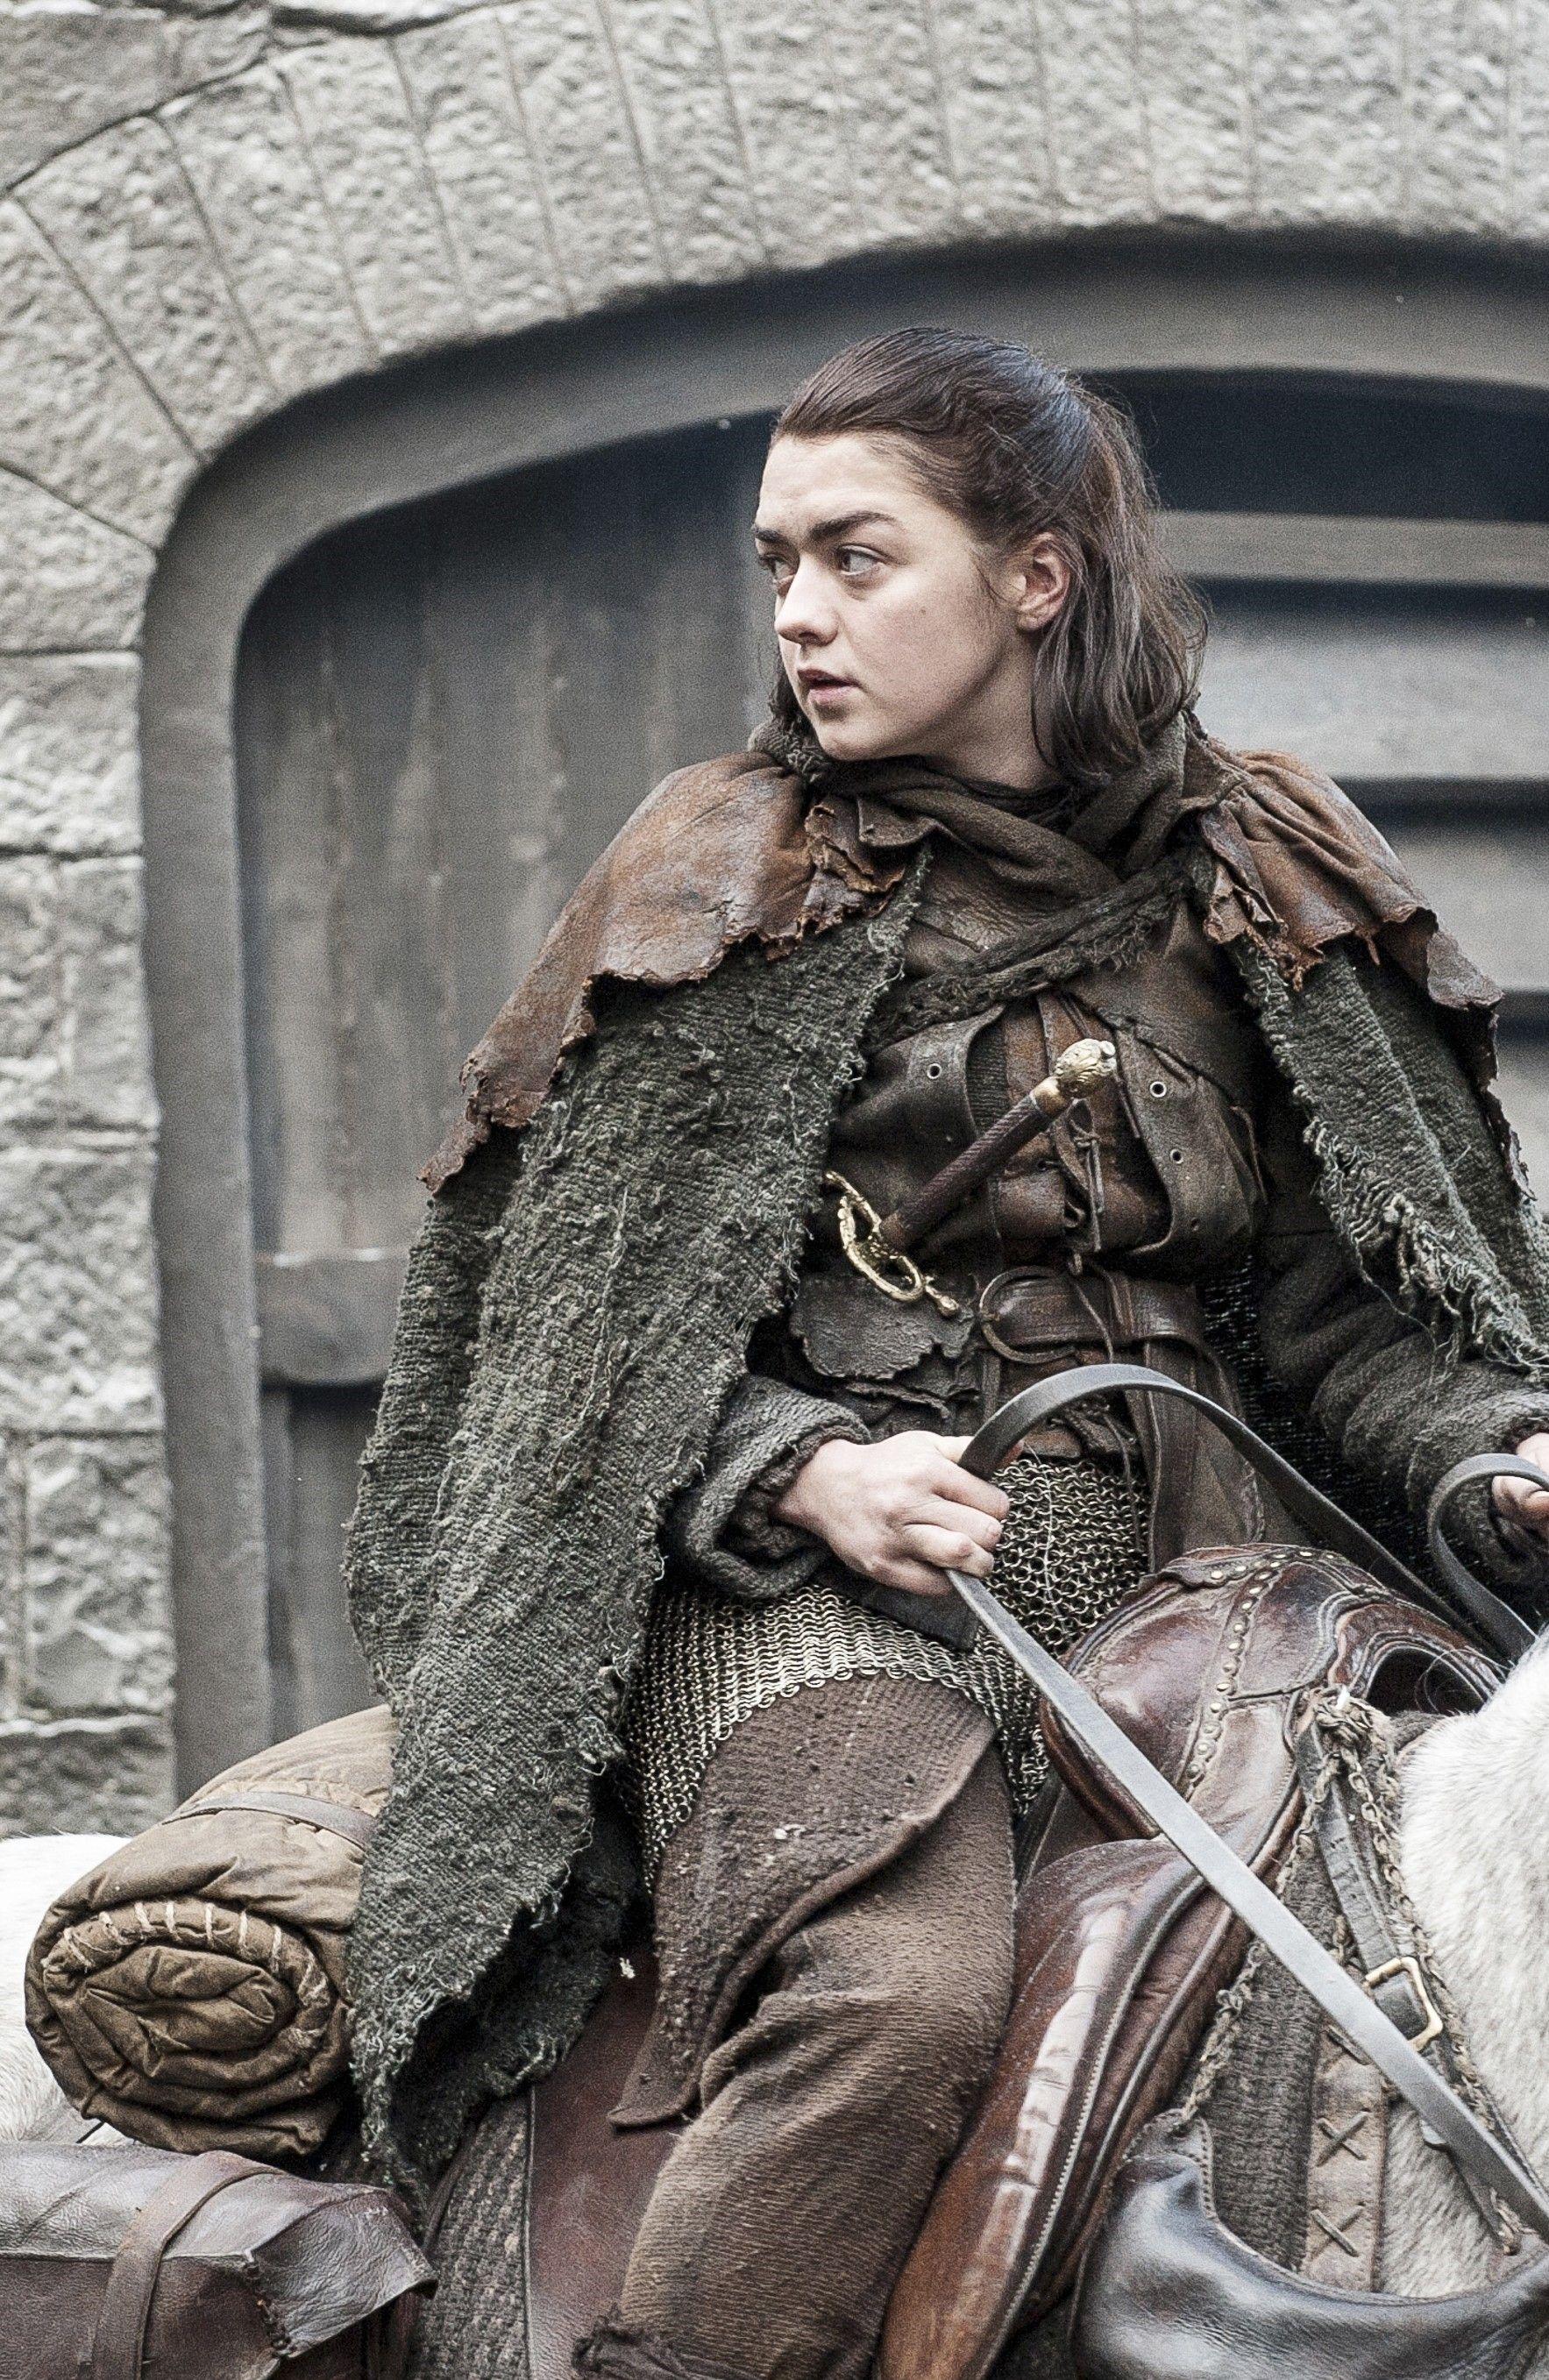 Game Of Thrones Season 7 Arya Stark Affiches Game Of Thrones Films Cinema Game Of Thrones Starks game of thrones season 7